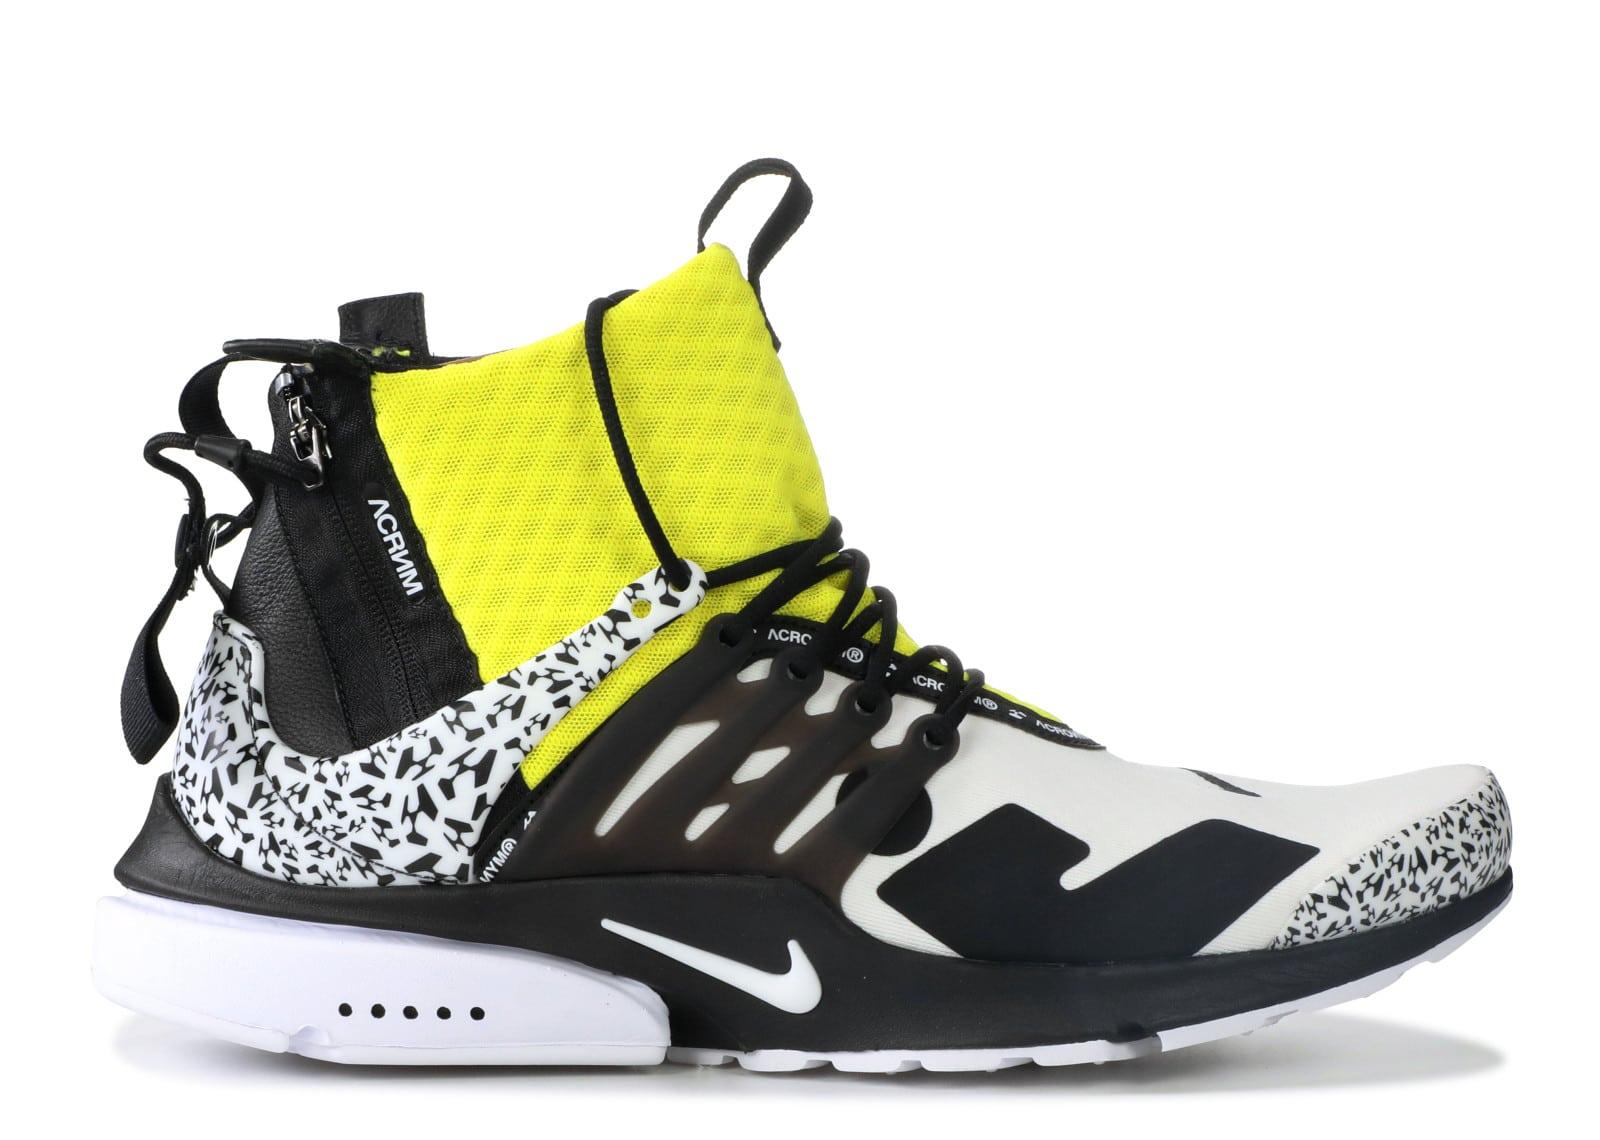 Bape X Kaws >> Nike Air Presto Mid Acronym Dynamic Yellow - kickstw